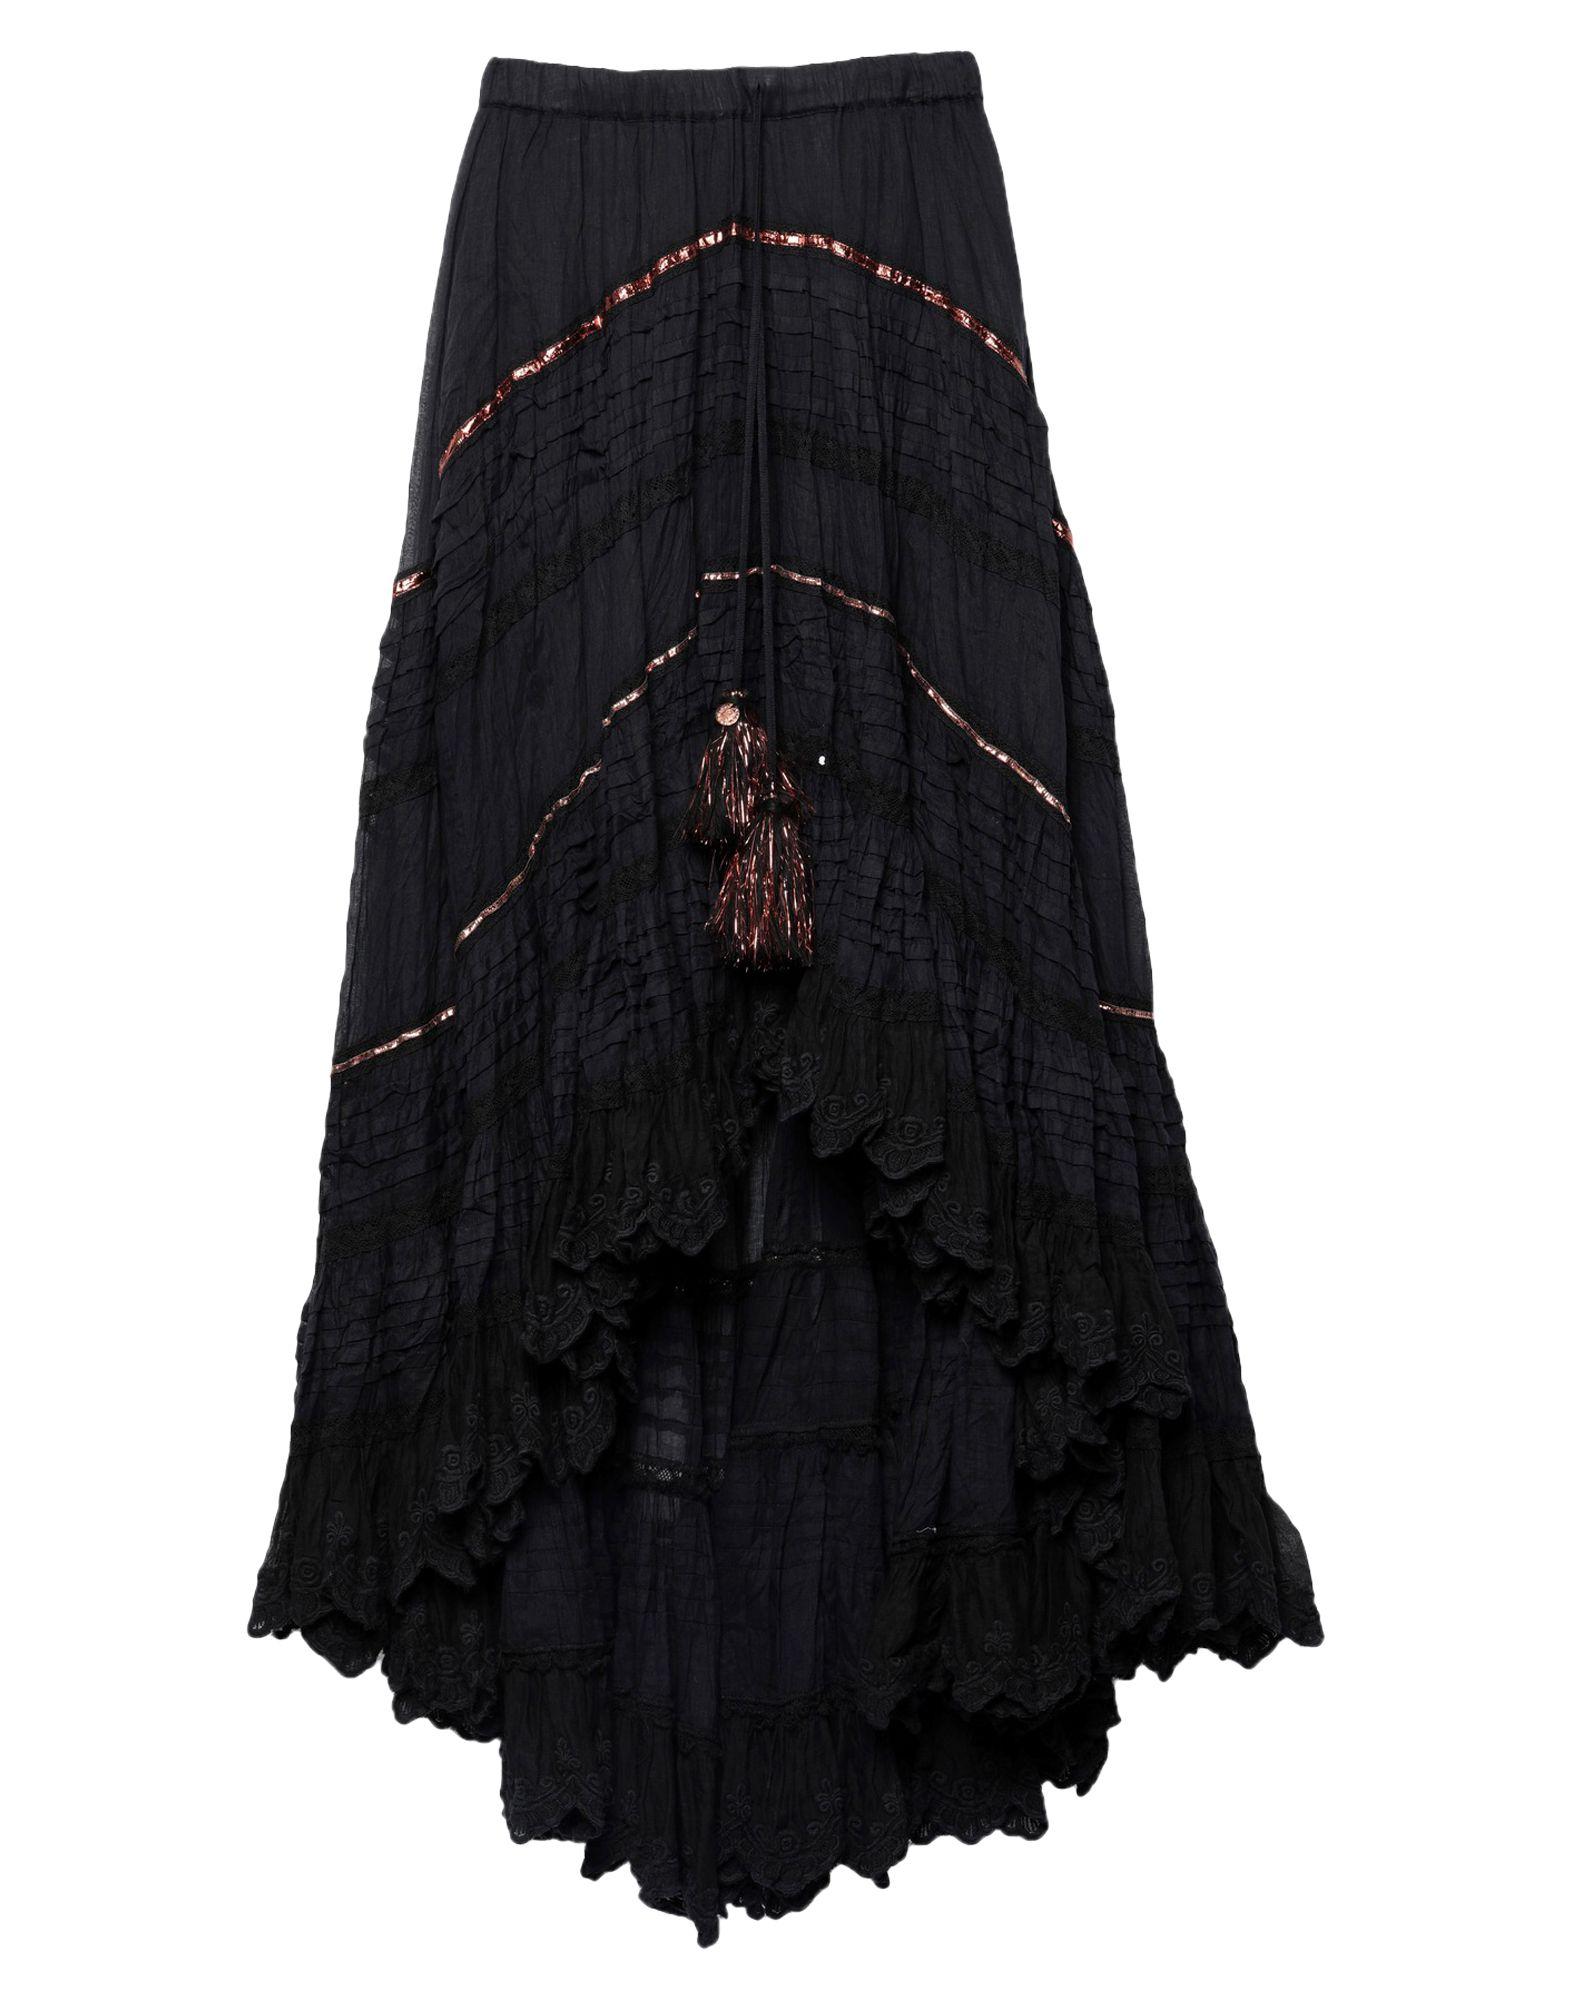 GADO GADO by MARGRIET WAGERAAR Длинная юбка